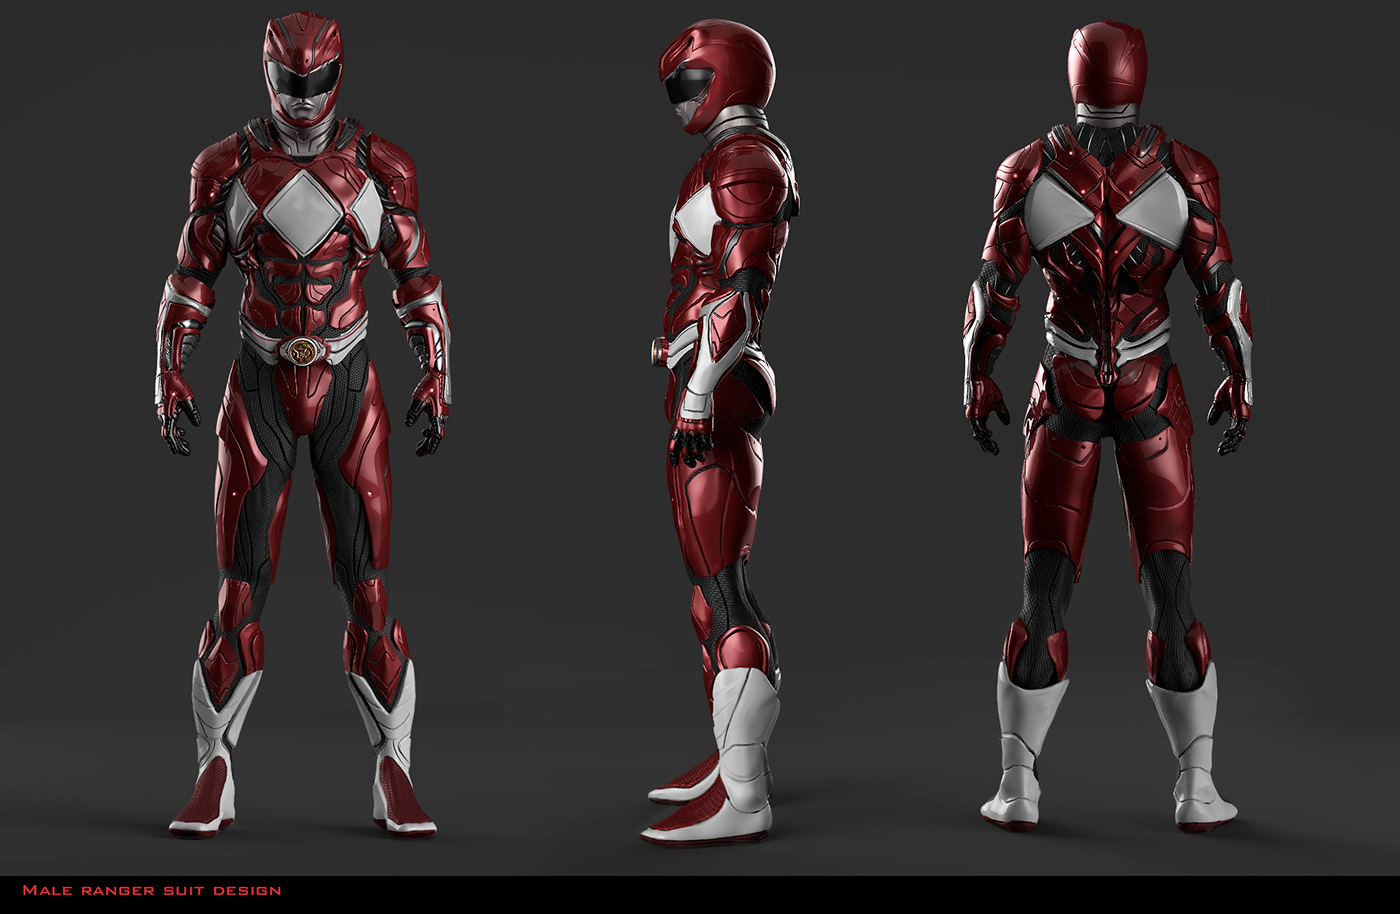 conceptart Conceptdesign mmpr PowerRangers projectnomad suitdesign